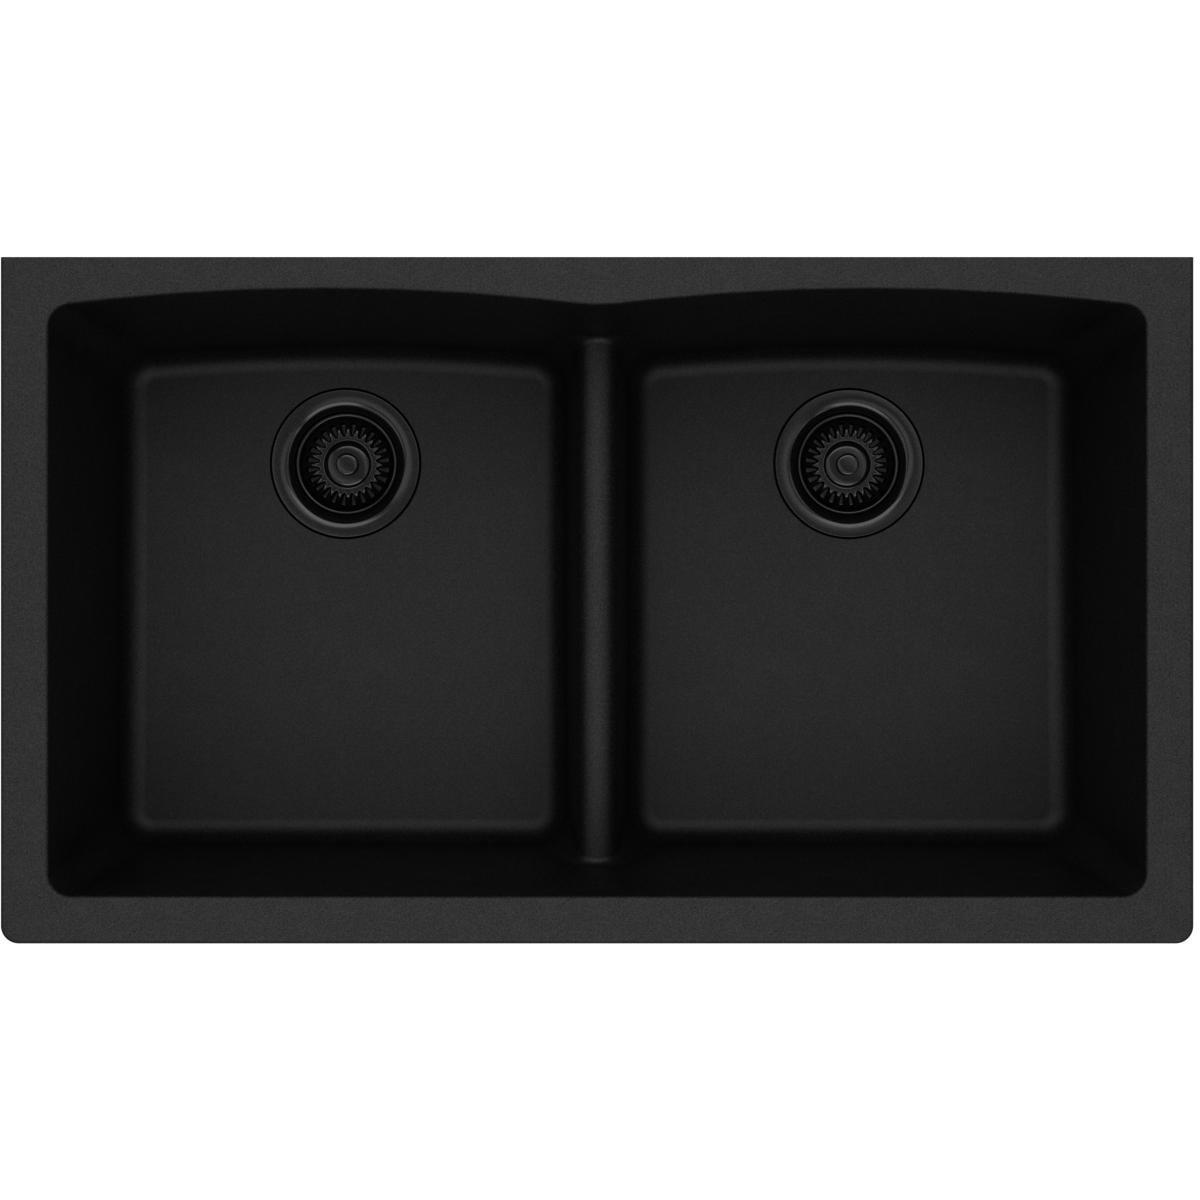 Elkay Quartz Classic ELGDULB3322BK0 Black Equal Double Bowl Undermount Sink